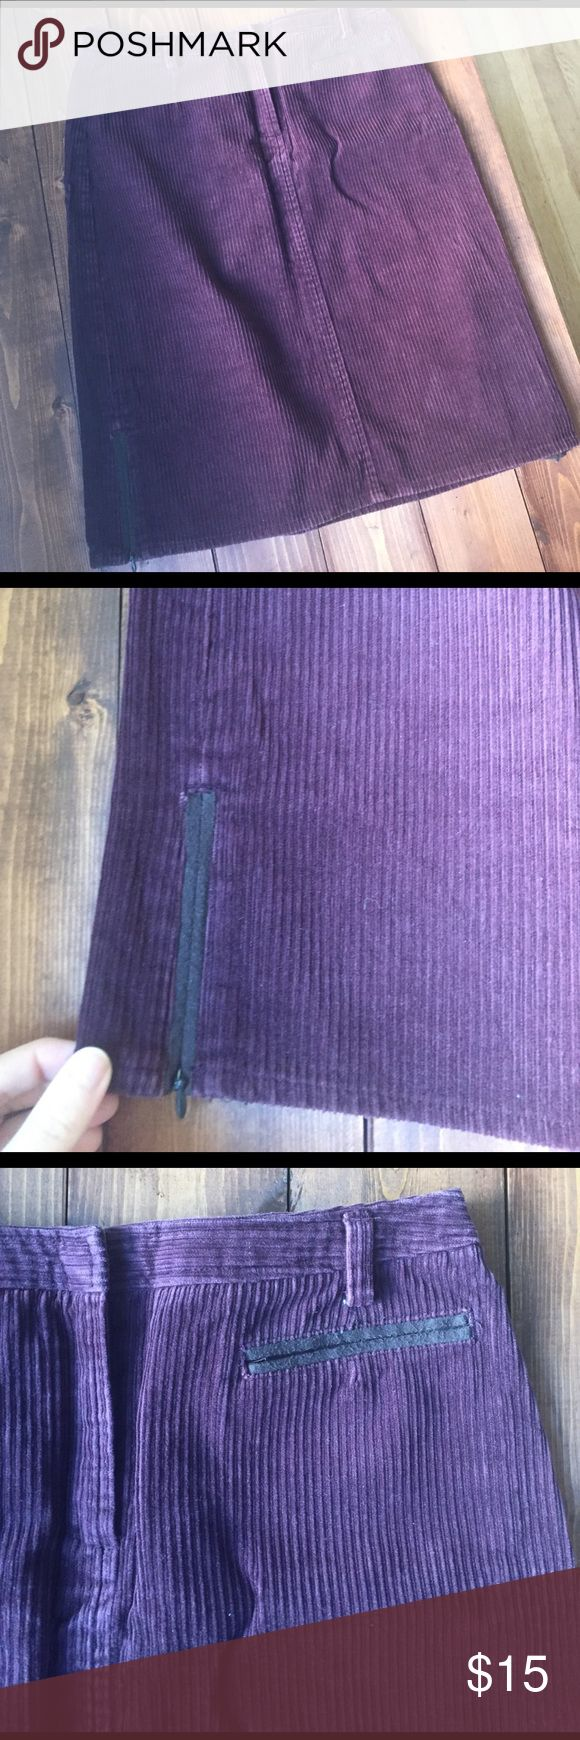 Petite pencil skirt Liz Claiborne 4P Burgundy cord pencil skirt in mint condition! Liz Claiborne Skirts Pencil